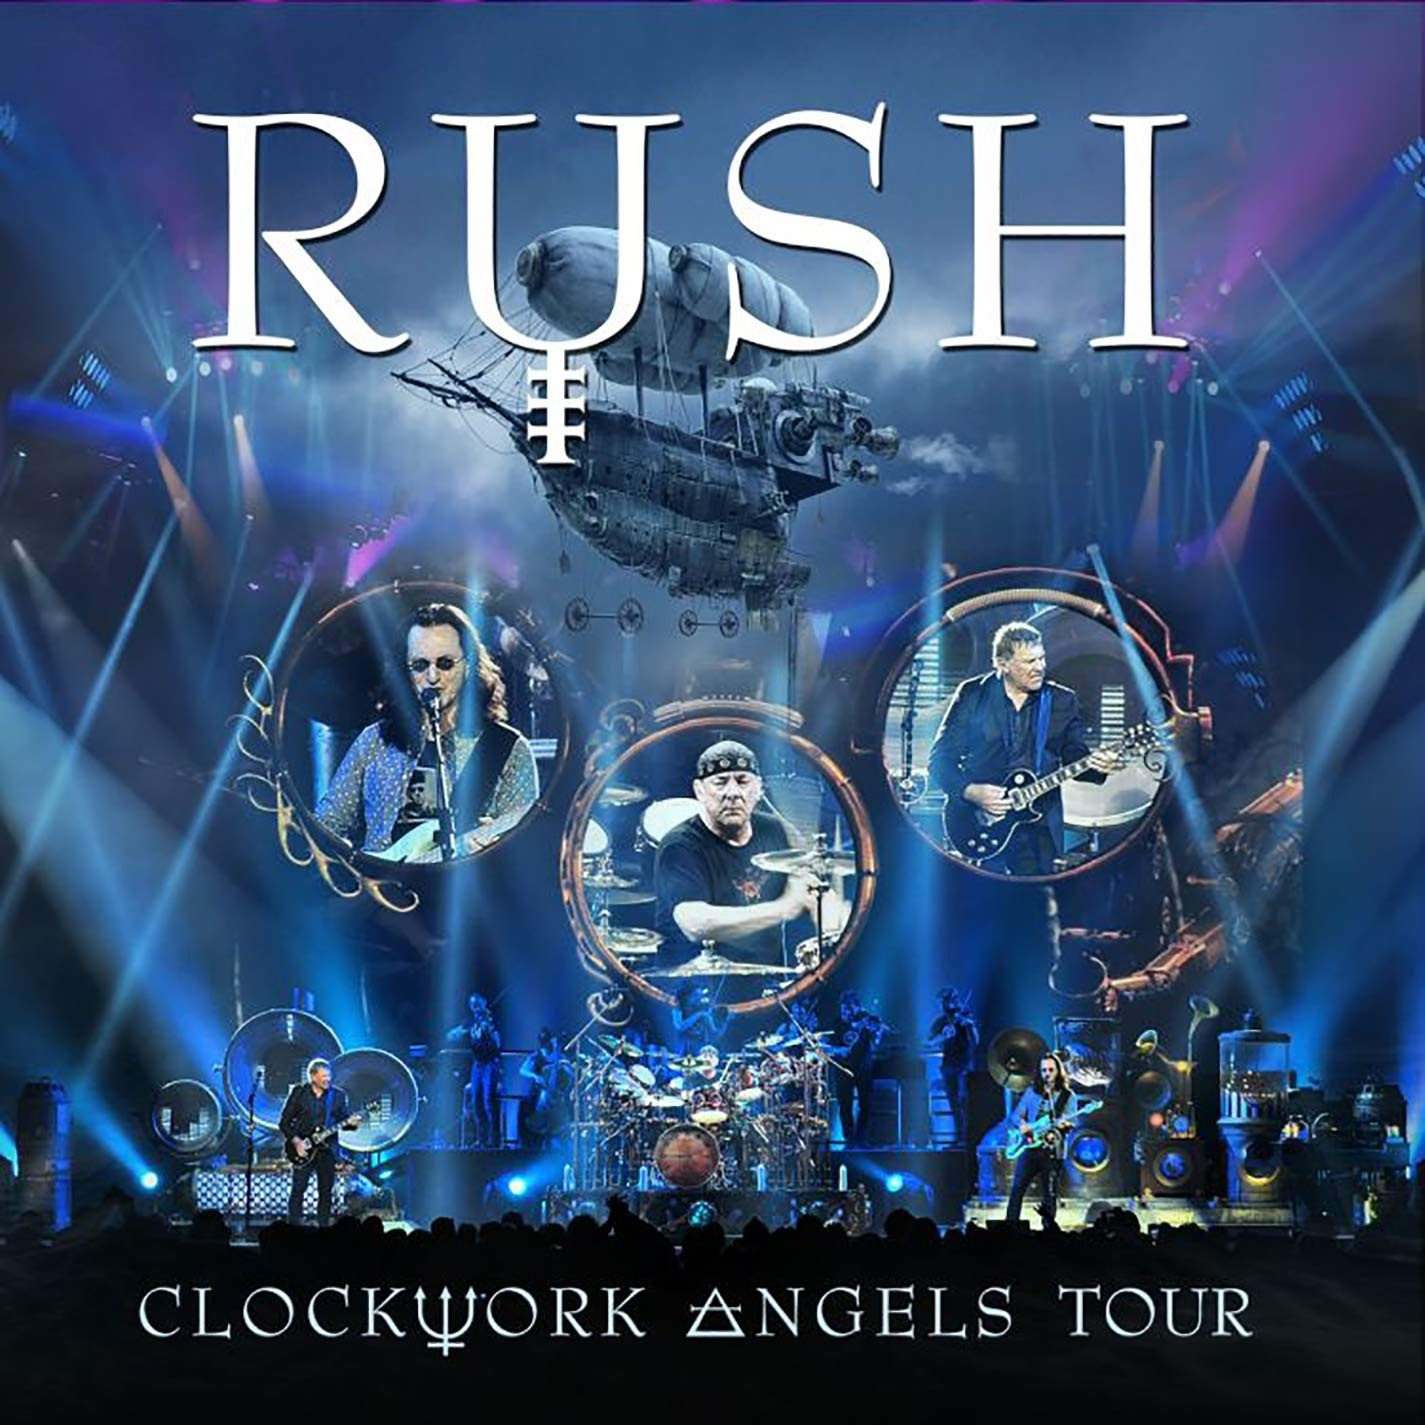 Rush - Clockwork Angels Tour 5XLP Boxset